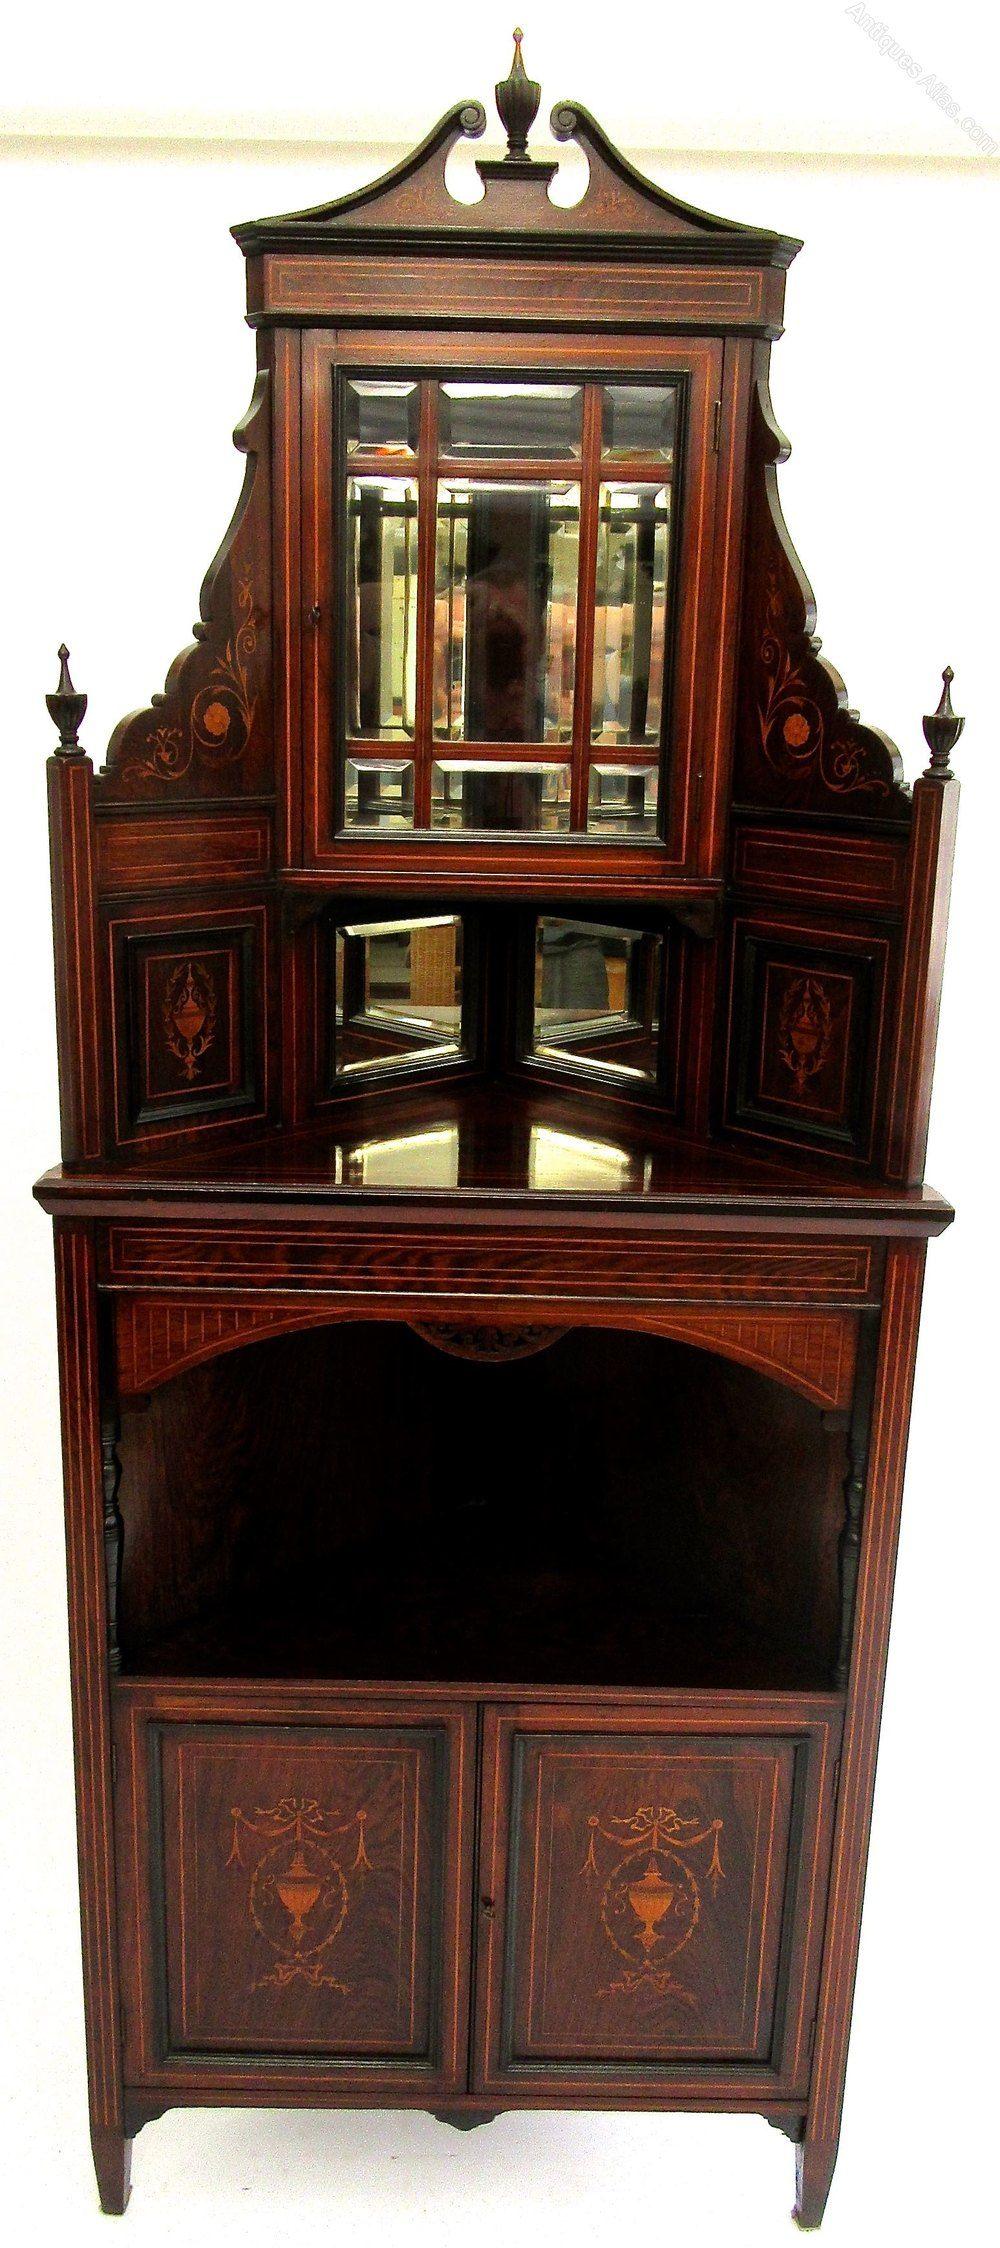 Victorian Rosewood Inlaid Corner Cupboard - Antiques Atlas ... on Corner Sconce Shelf Cabinet id=54801